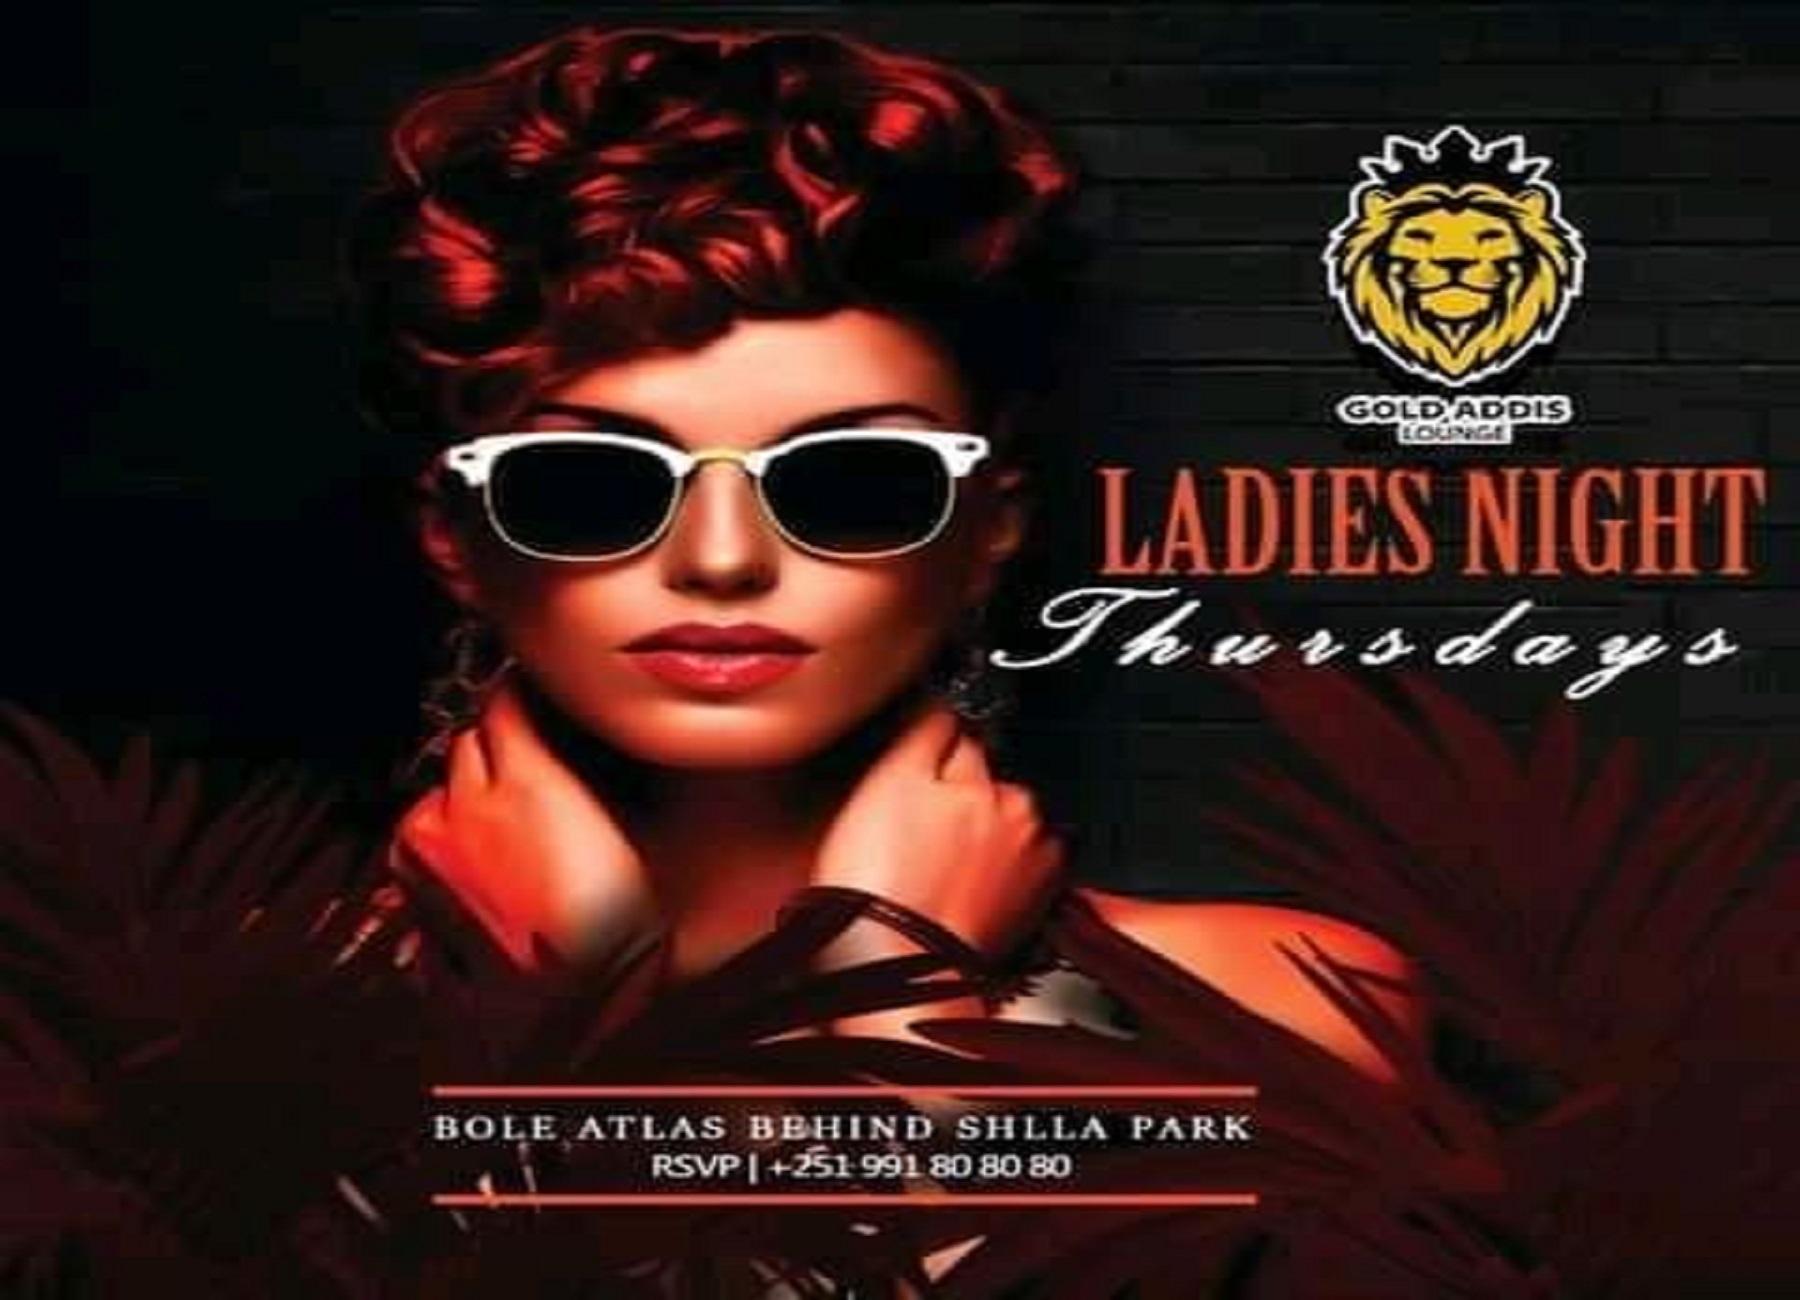 Ladies Night Thursdays